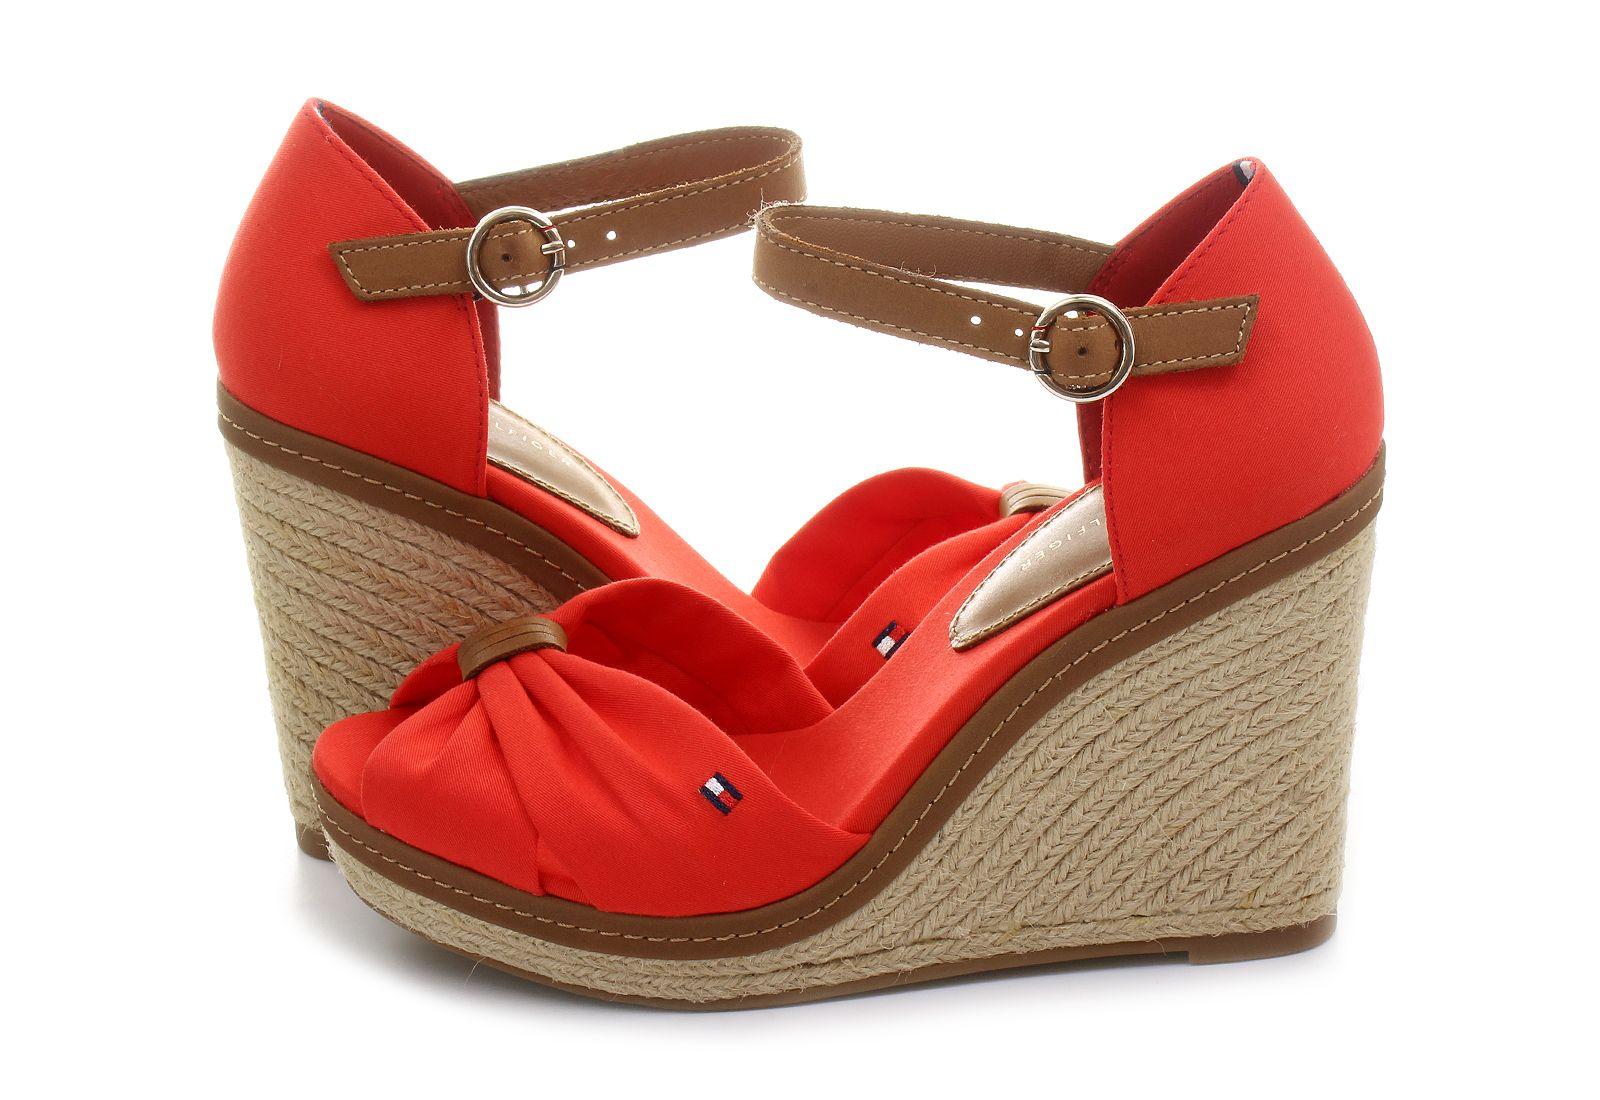 1b00a893c59740 Tommy Hilfiger Sandals - Elena 56d - 17S-0905-617 - Online shop for ...